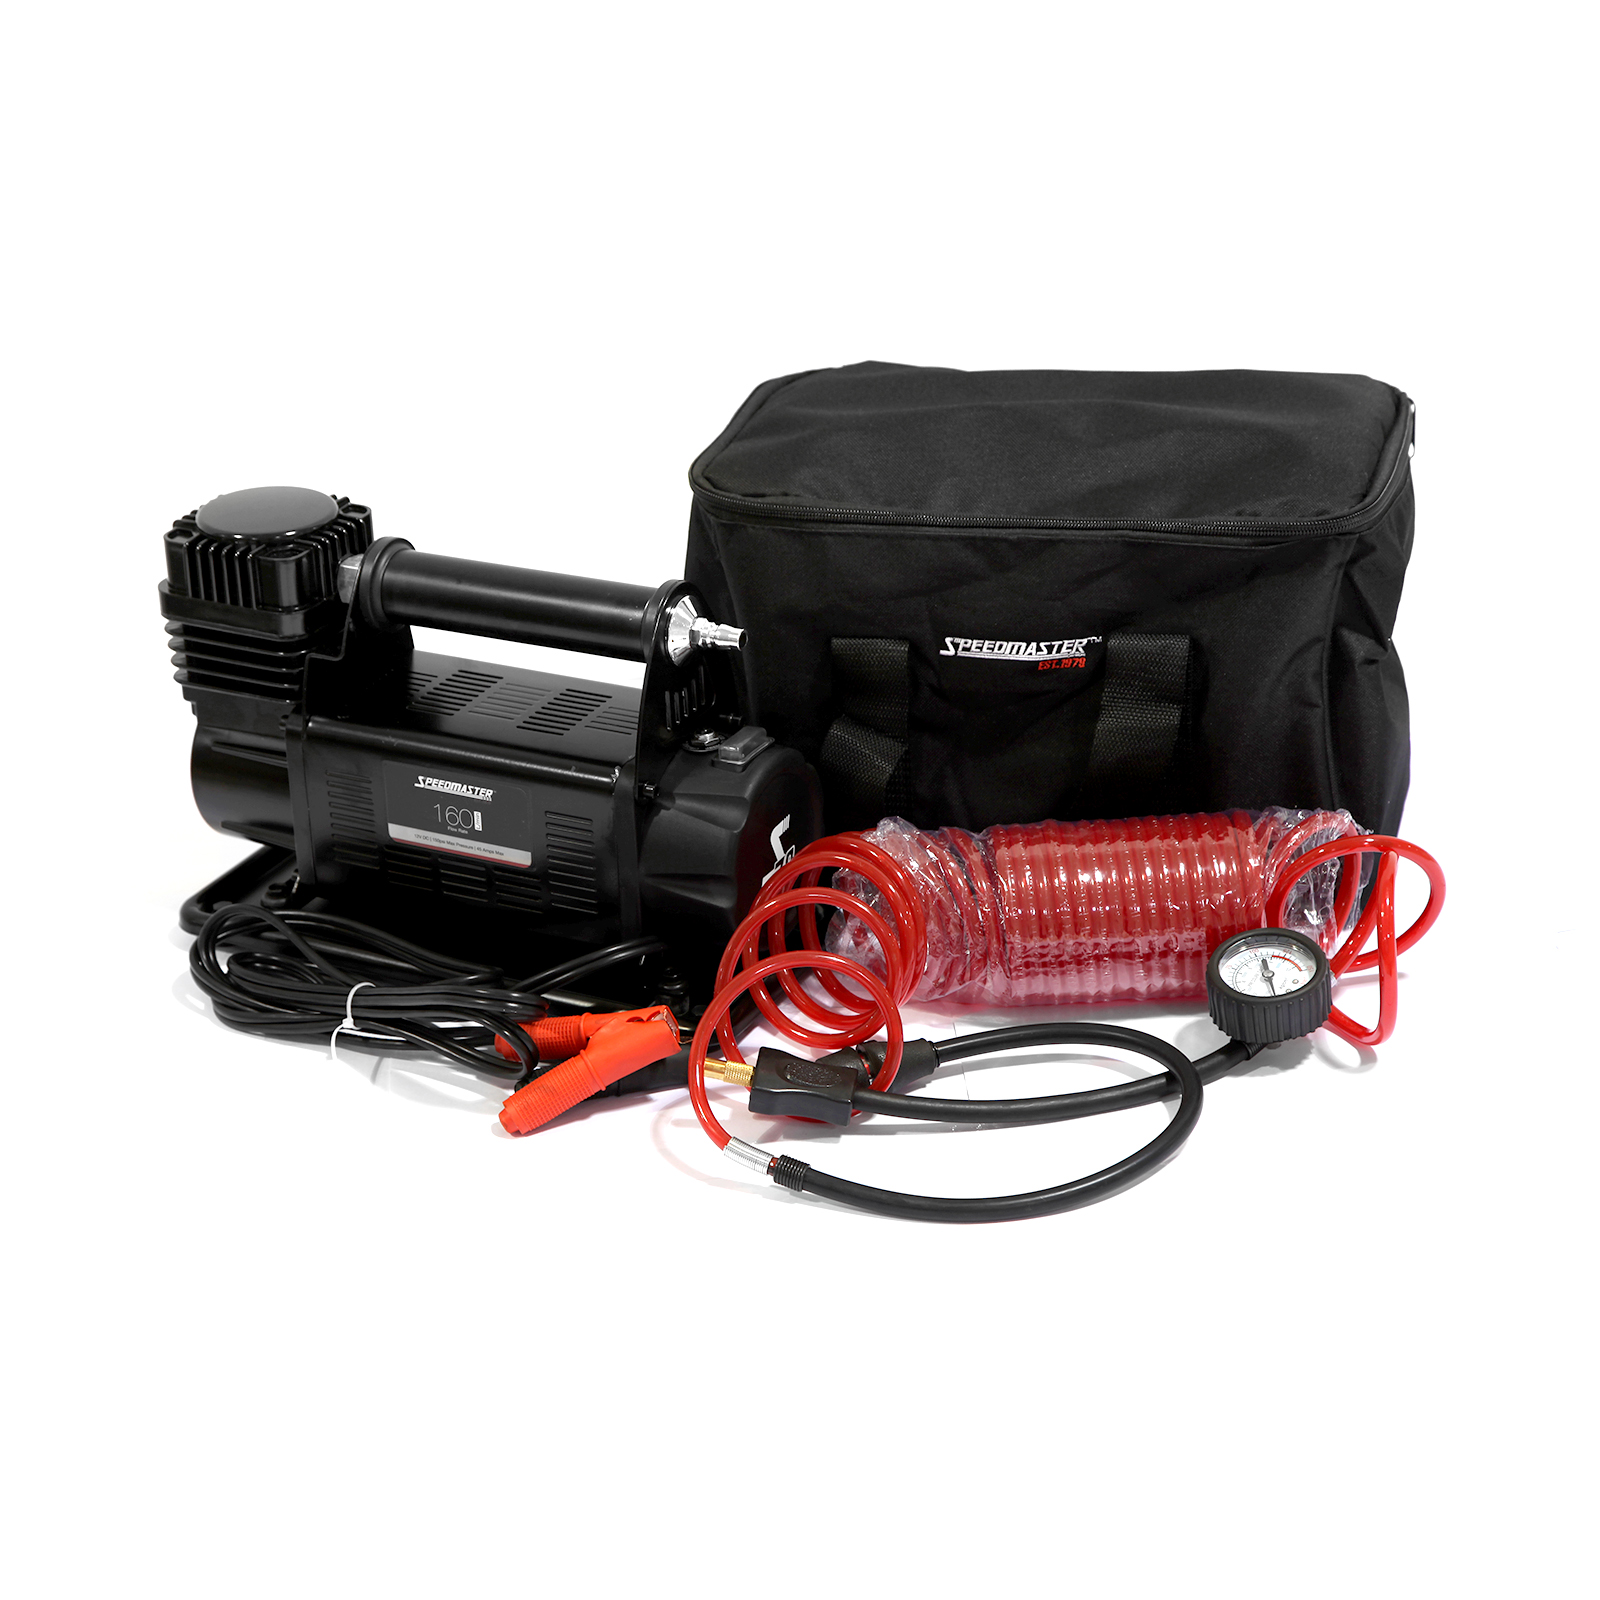 12v Car Air Compressor 4x4 Tyre Deflator 4wd Portable Inflator 160L